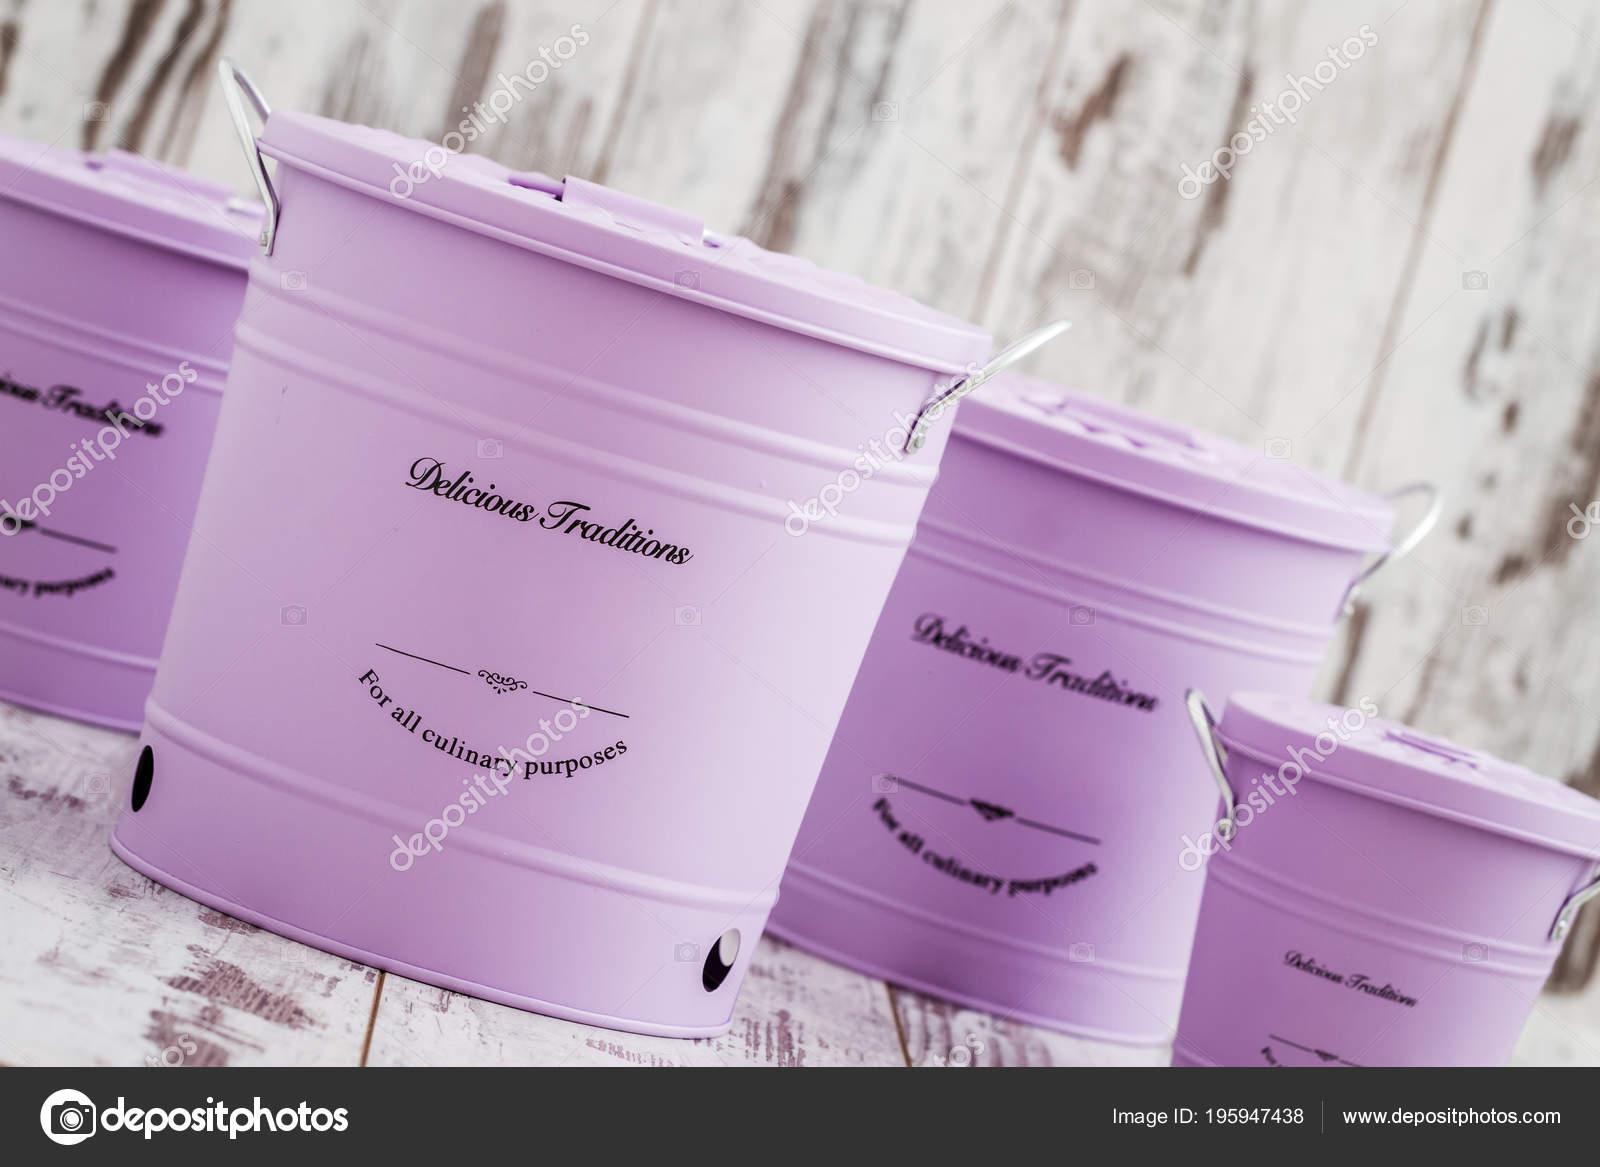 Vintage Purple Potato Onion Garlic Storage Containers White Wooden